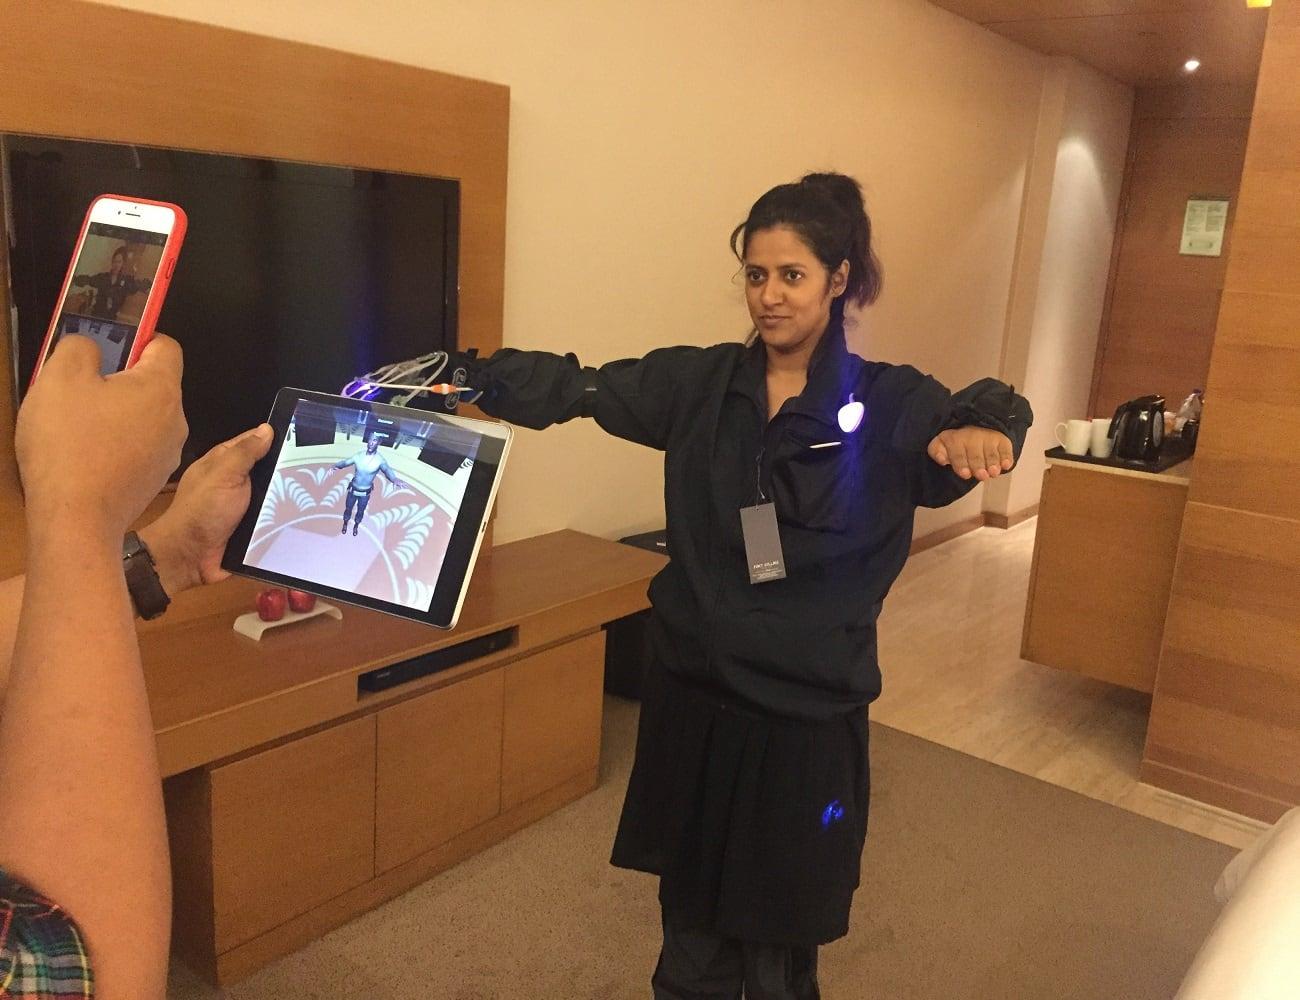 HoloSuit Full Body Motion Capture Suit